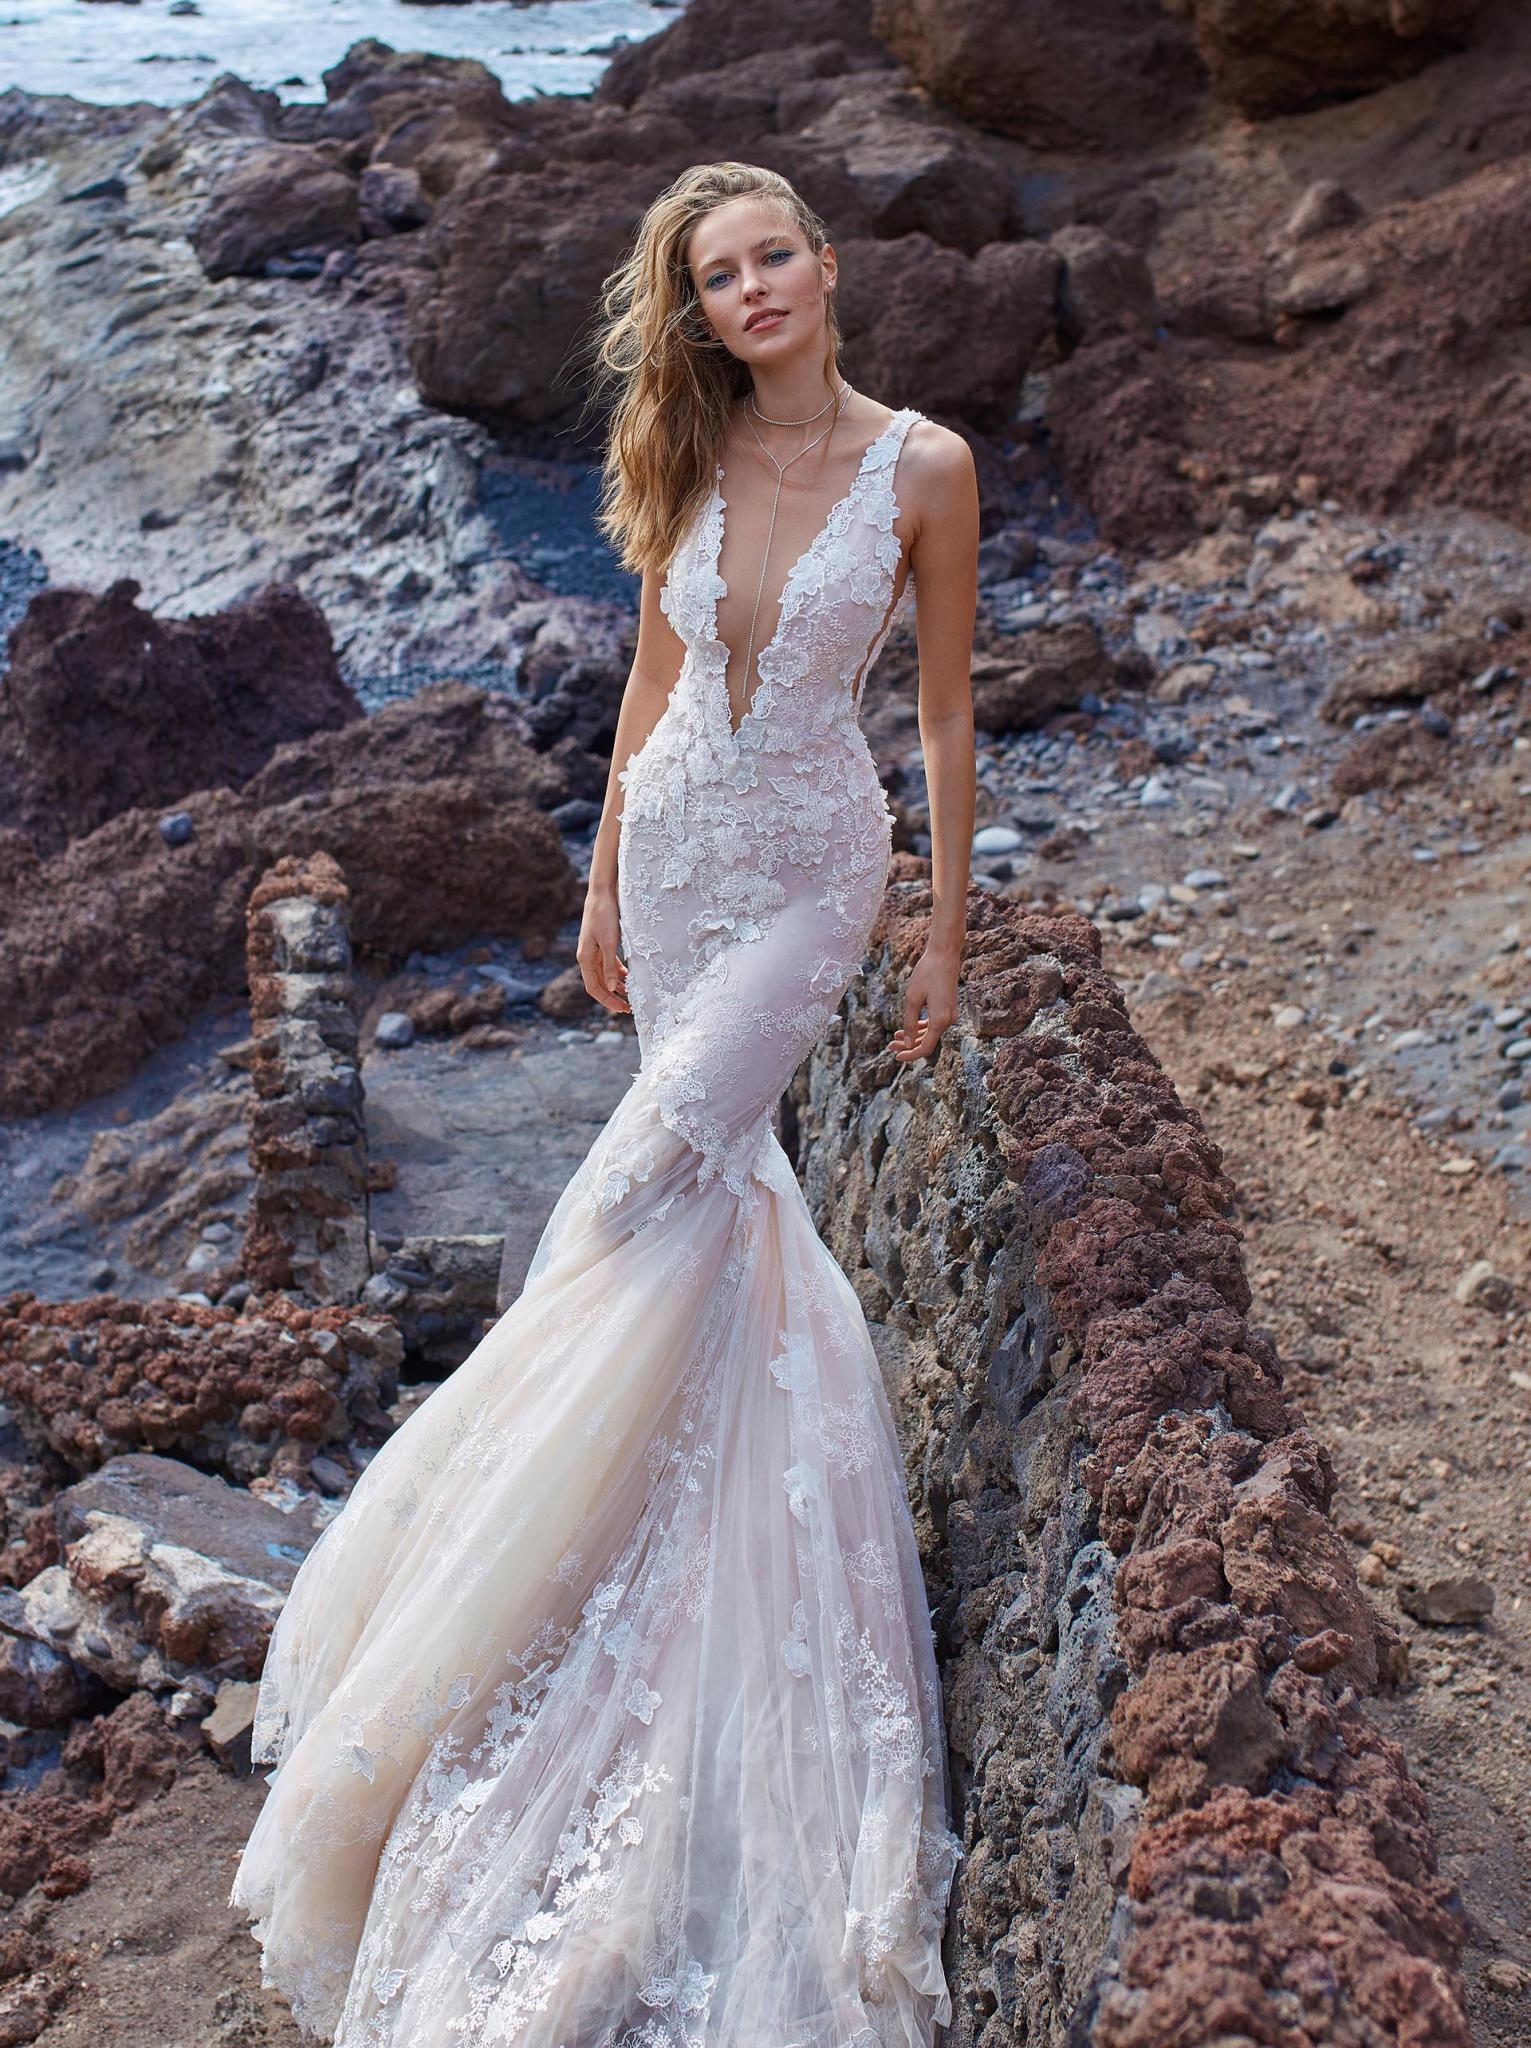 GALA-1001 - Collection No. V - Bridal Dresses - Galia Lahav